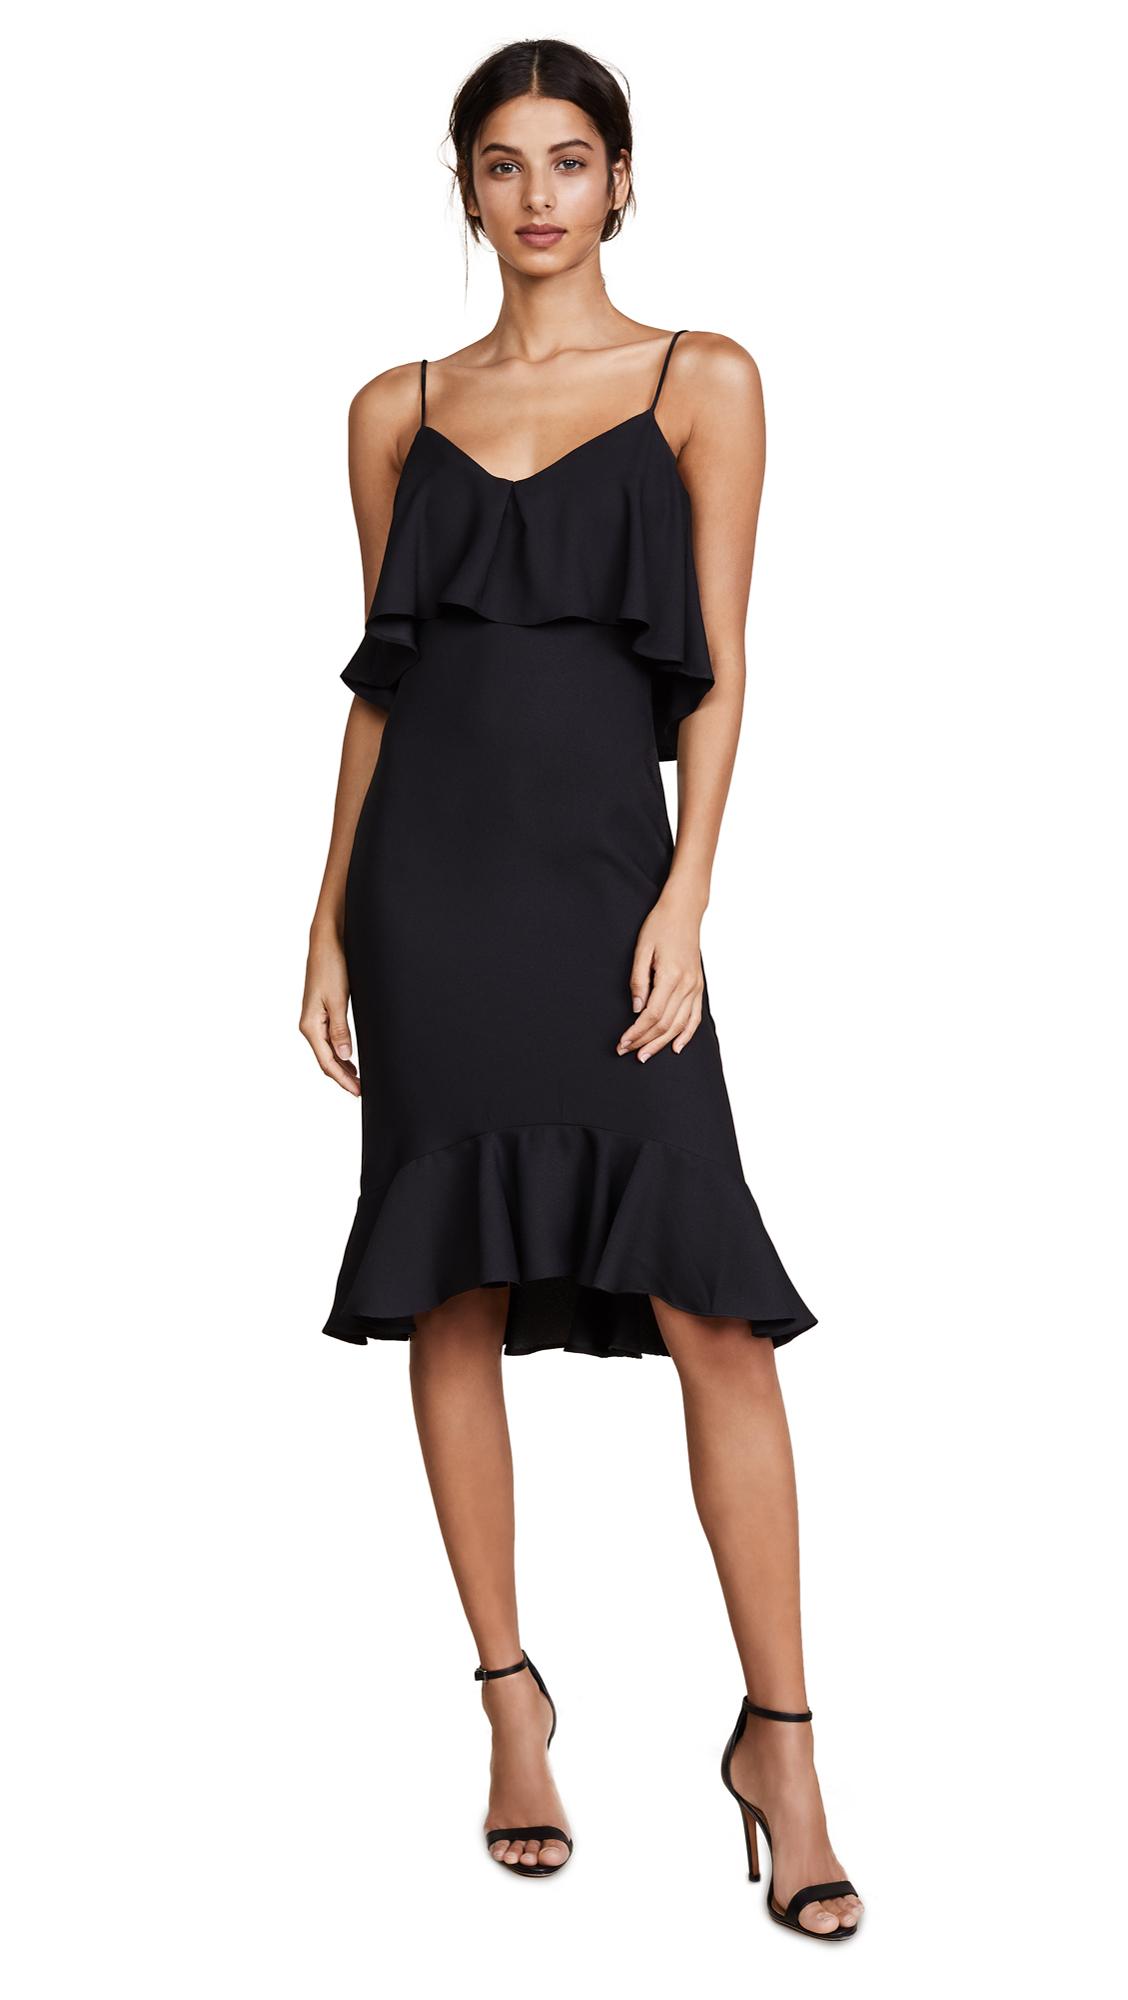 LIKELY Ardsley Dress